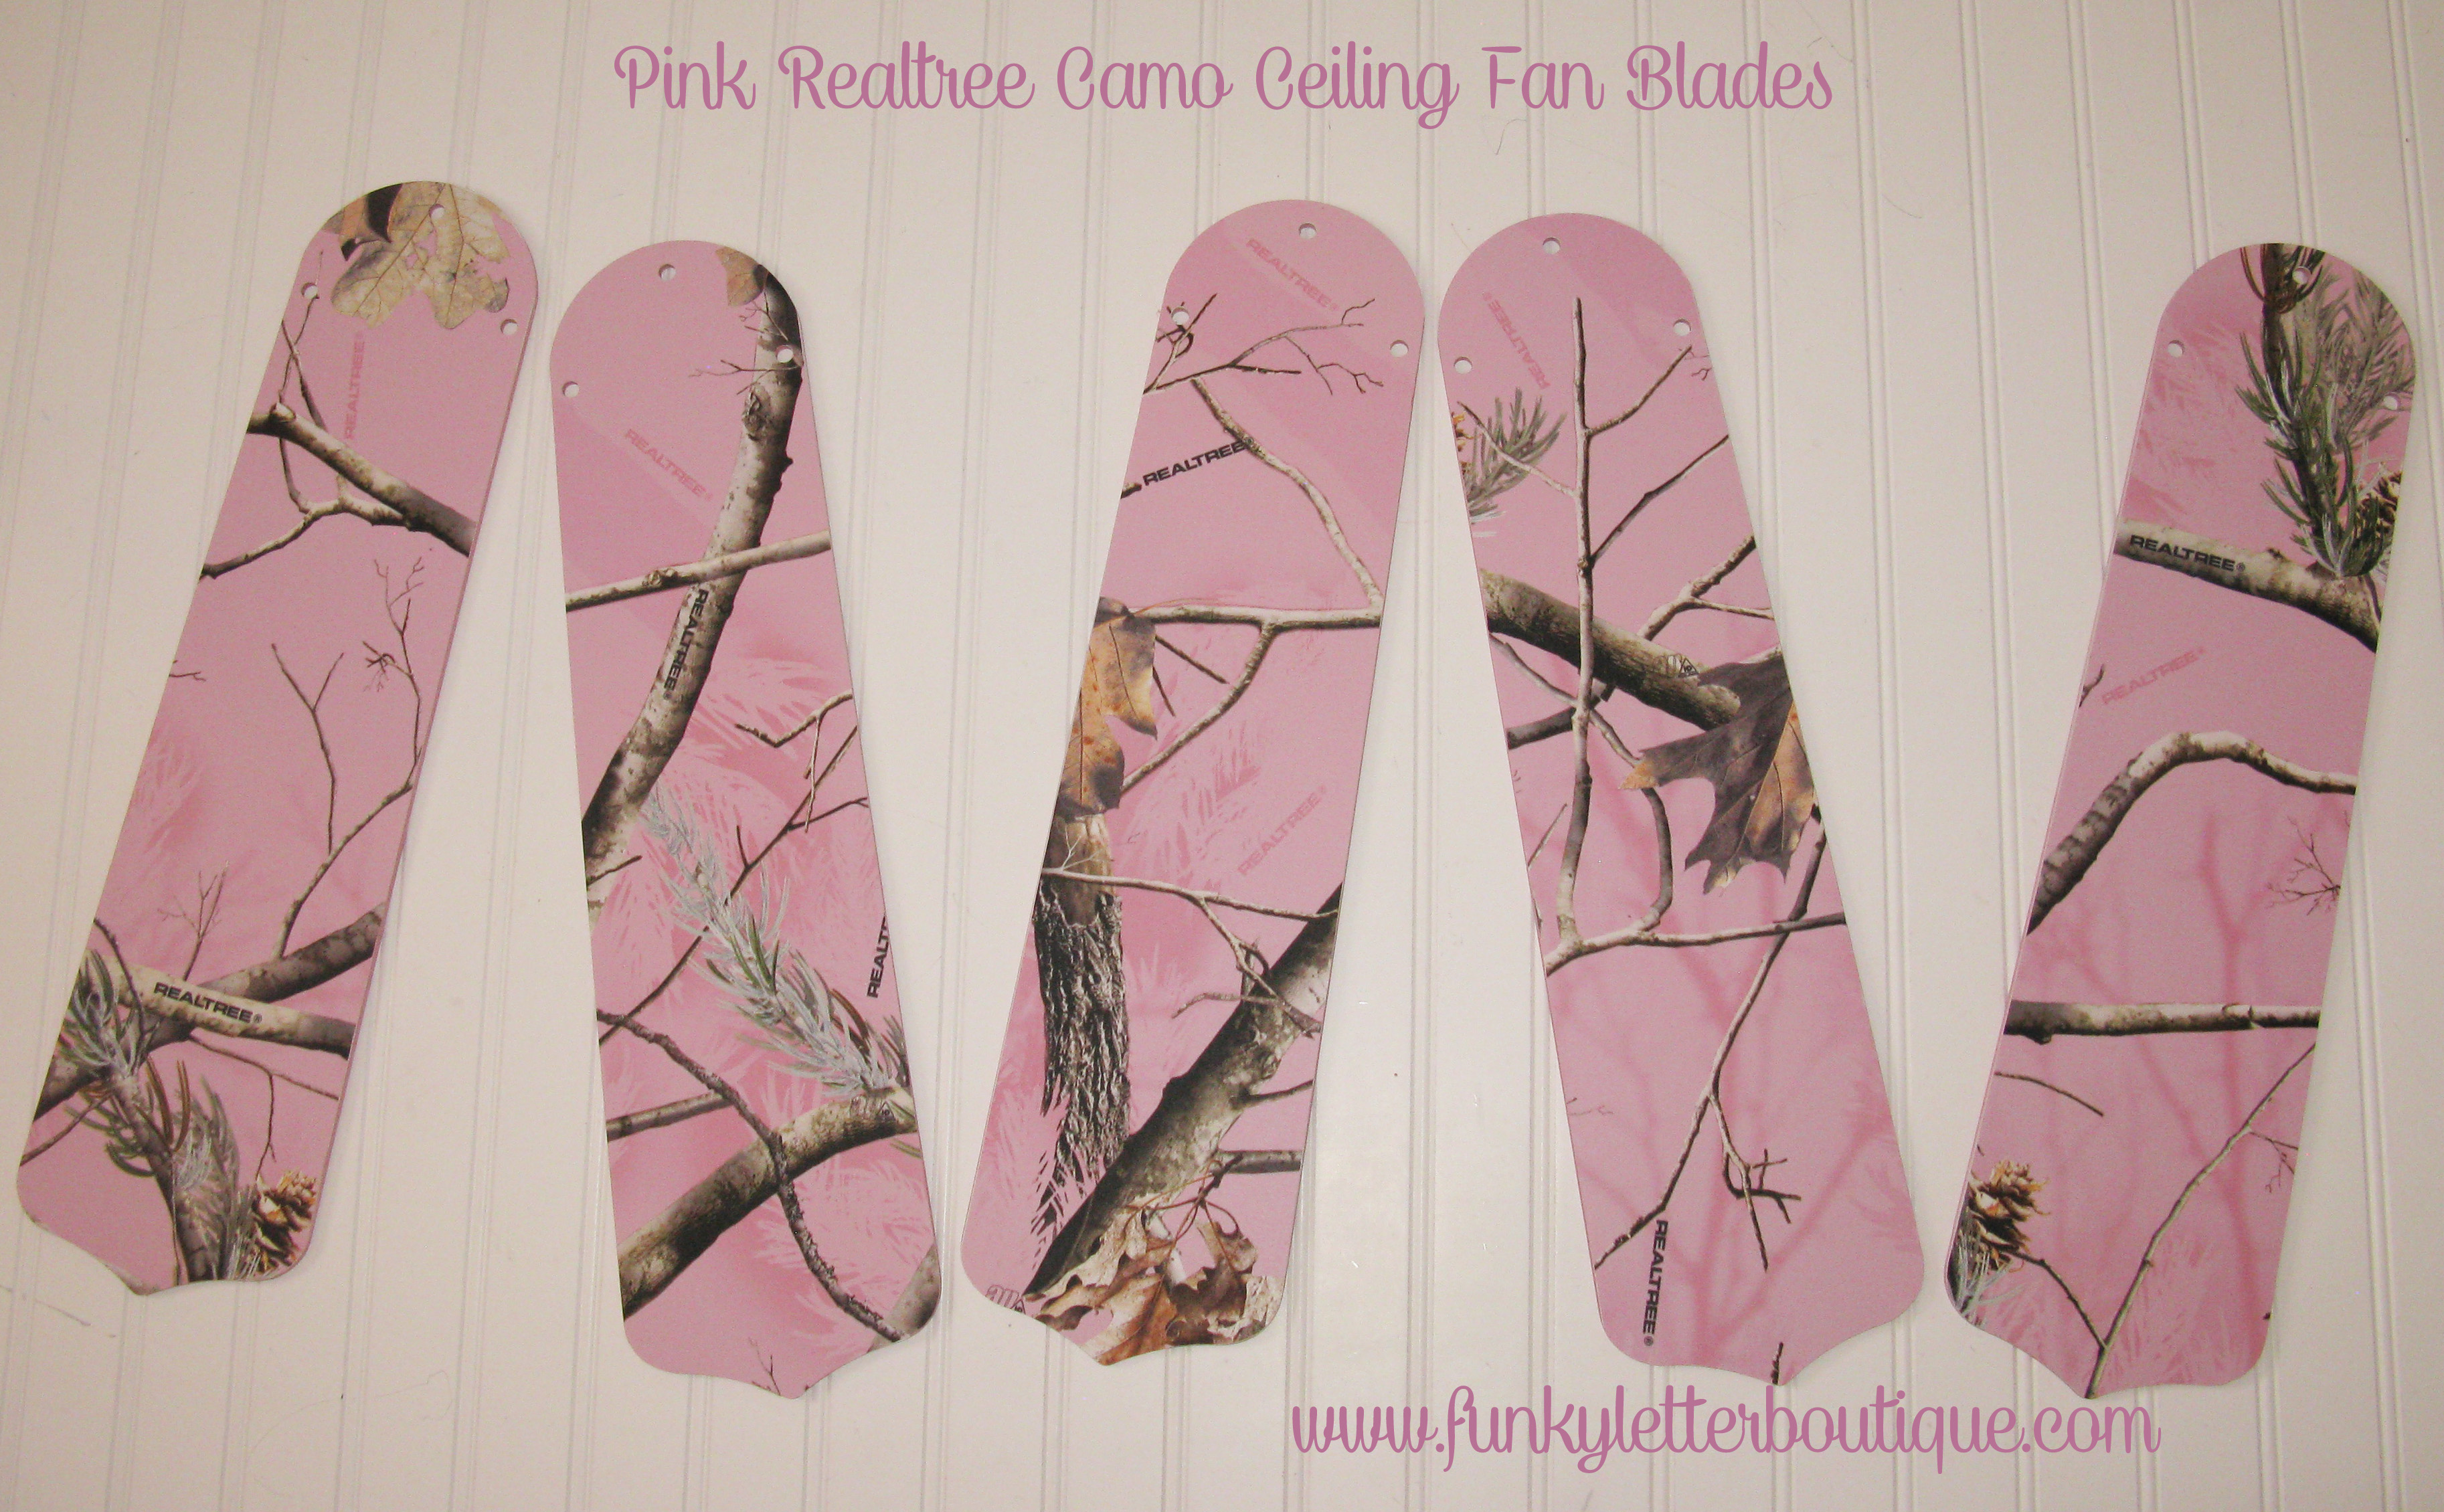 Pink realtree ap camo ceiling fan blades funky letter boutique pink realtree ap camo ceiling fan blades aloadofball Choice Image